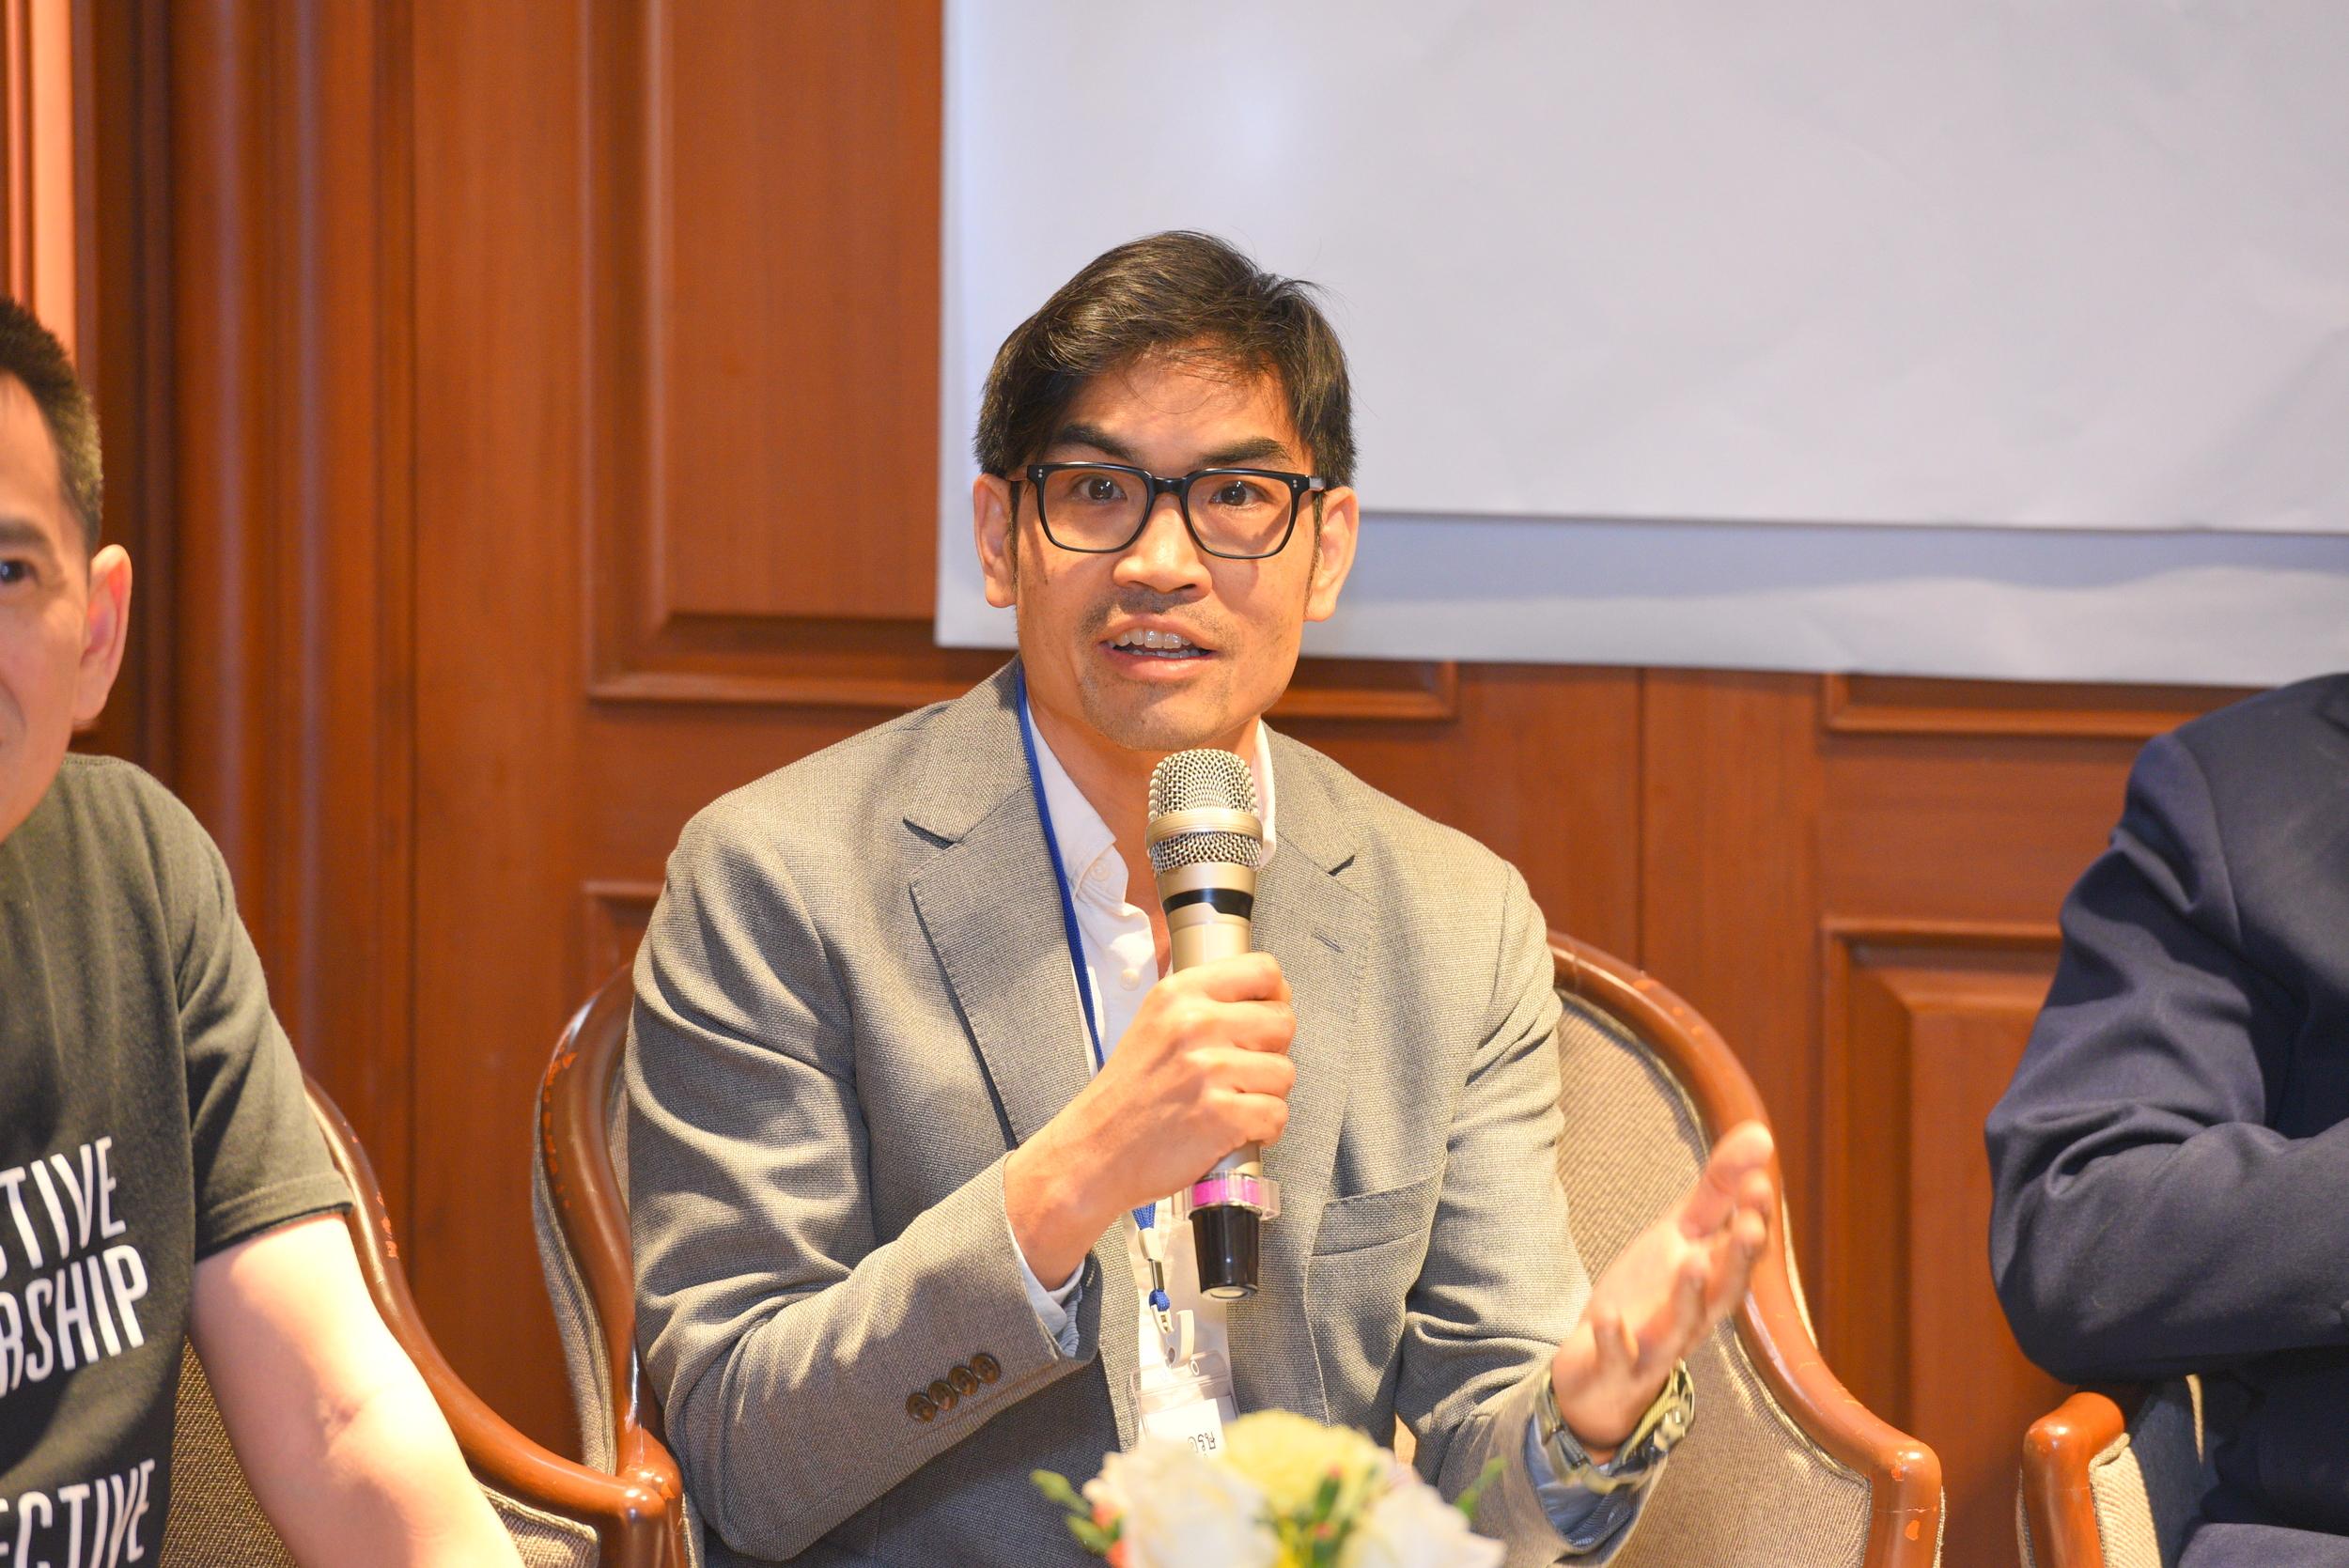 Organic Tourism โมเดลท่องเที่ยวสู่ระบบอาหารยั่งยืน thaihealth